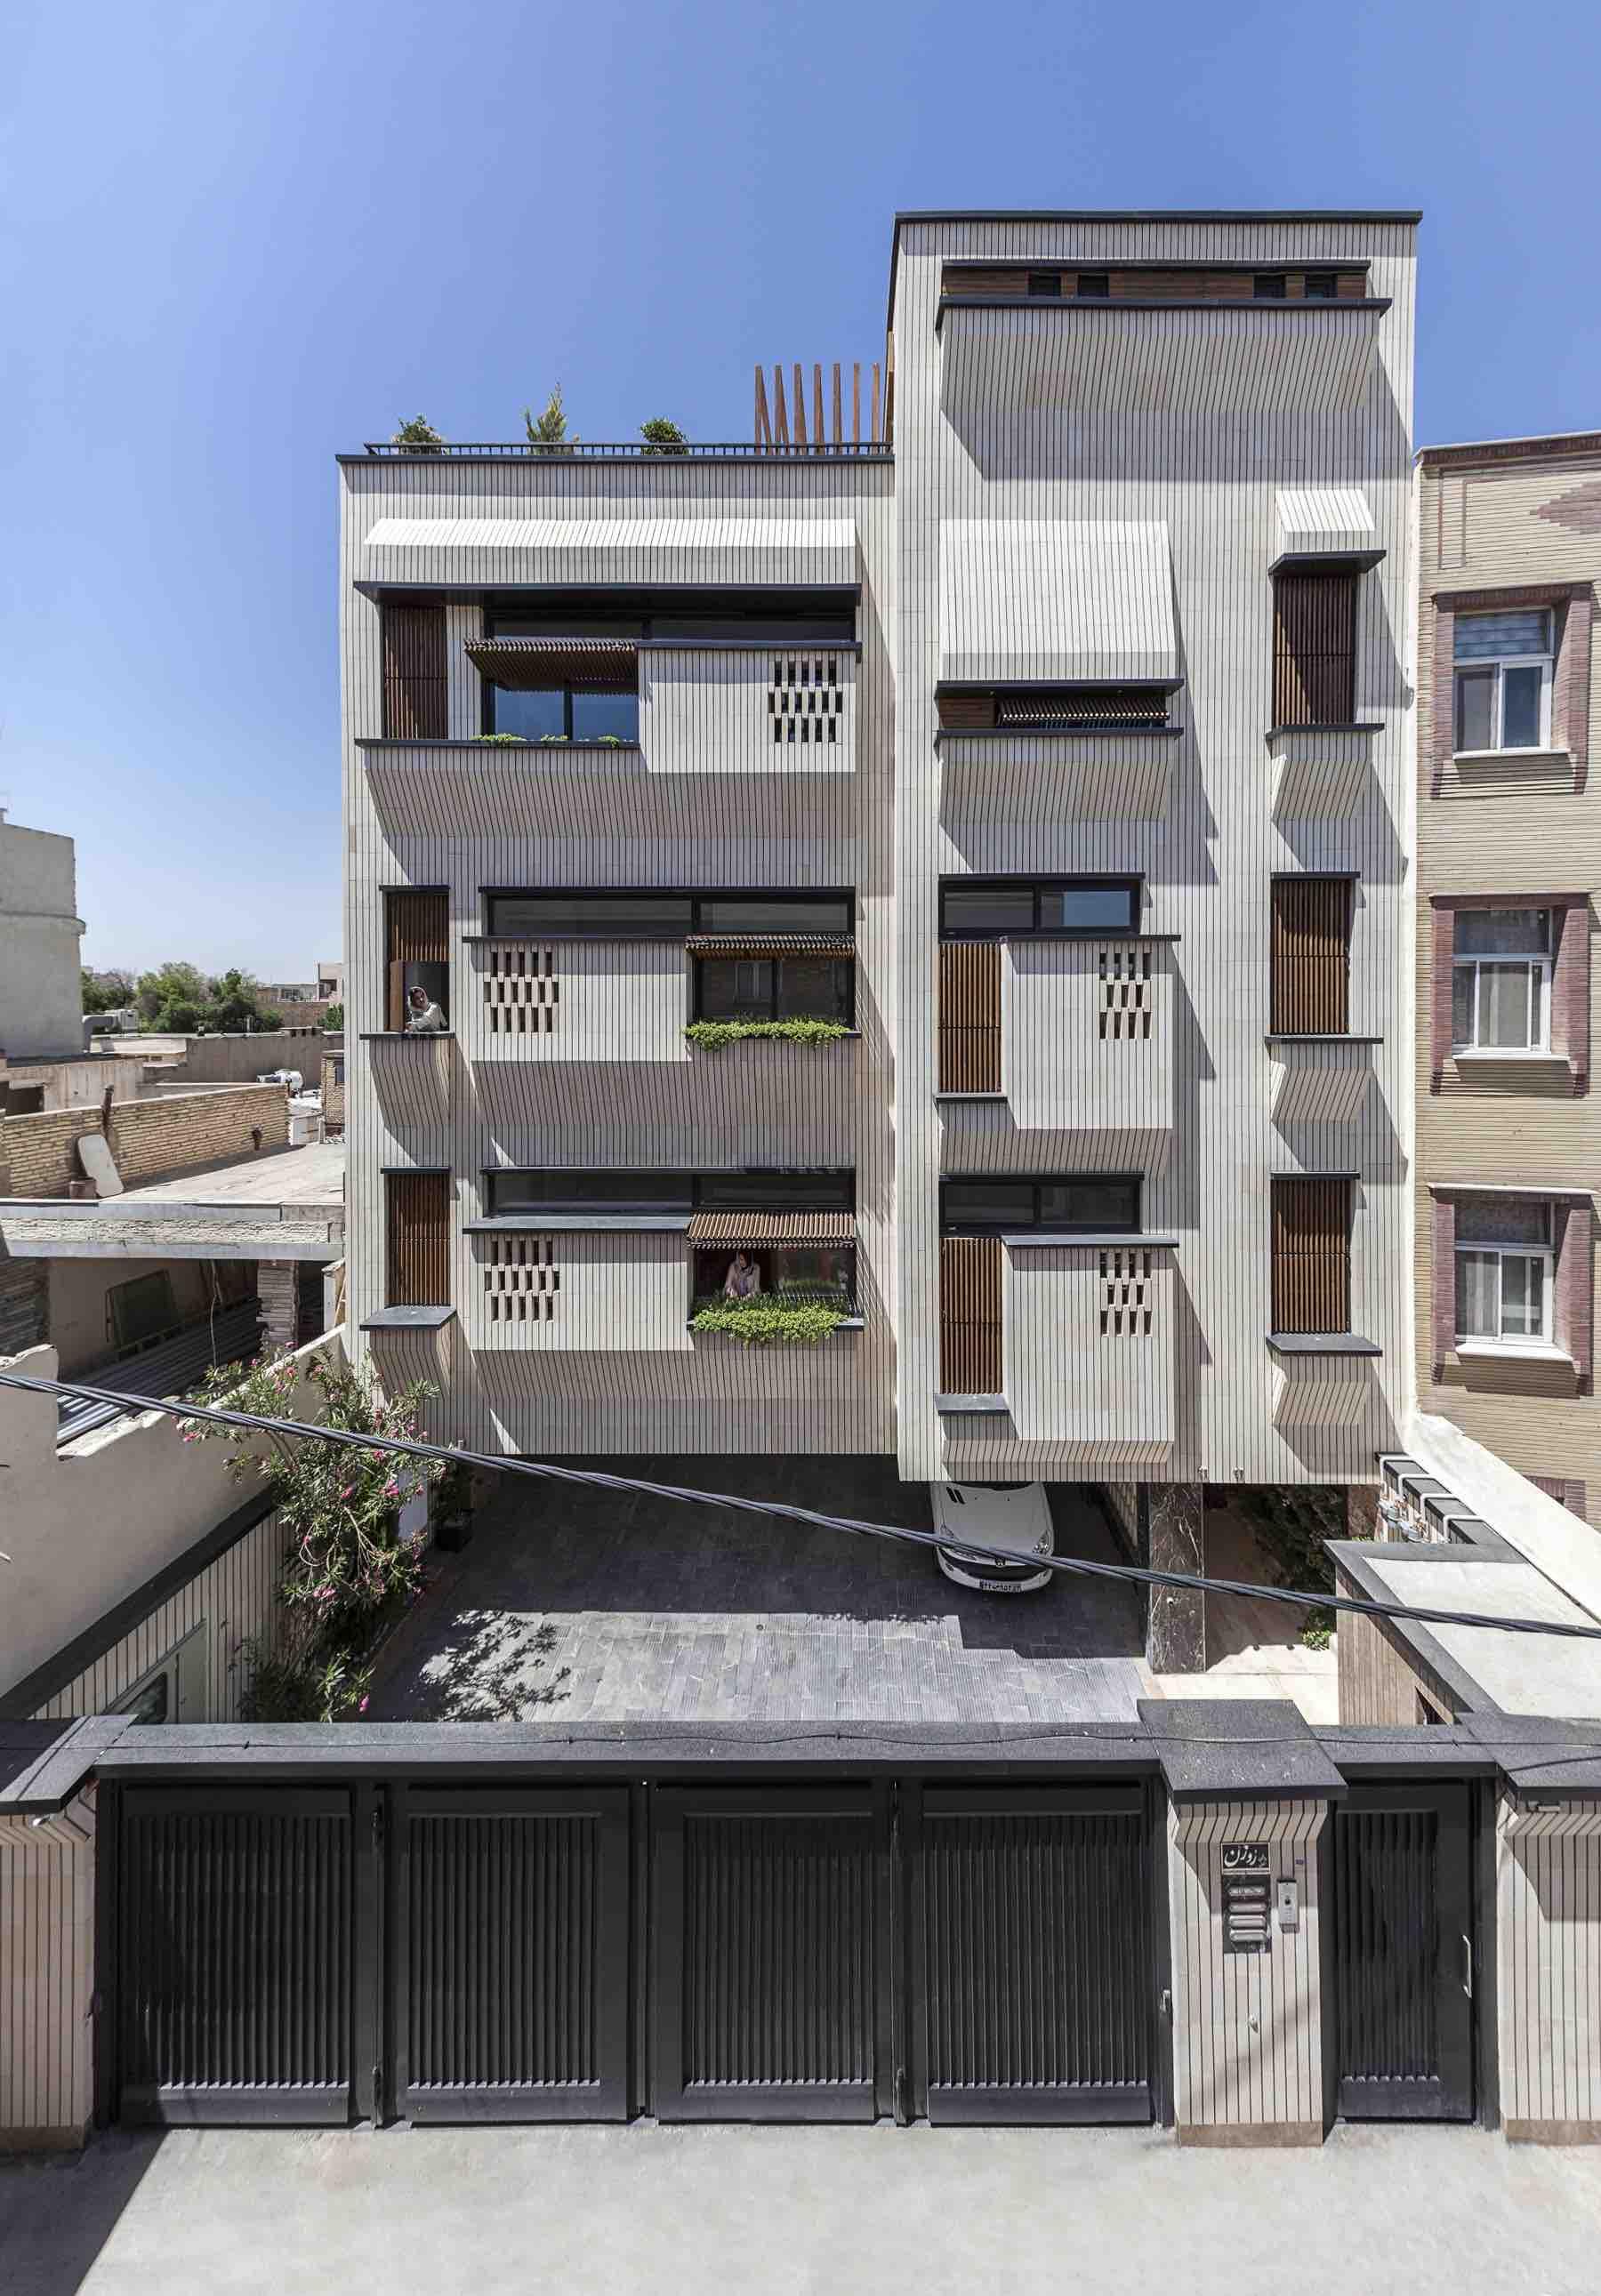 Rouzan_Residential_Building_Sayed_hamed_jafari_Charchoob_Architecture_Office_001.jpg